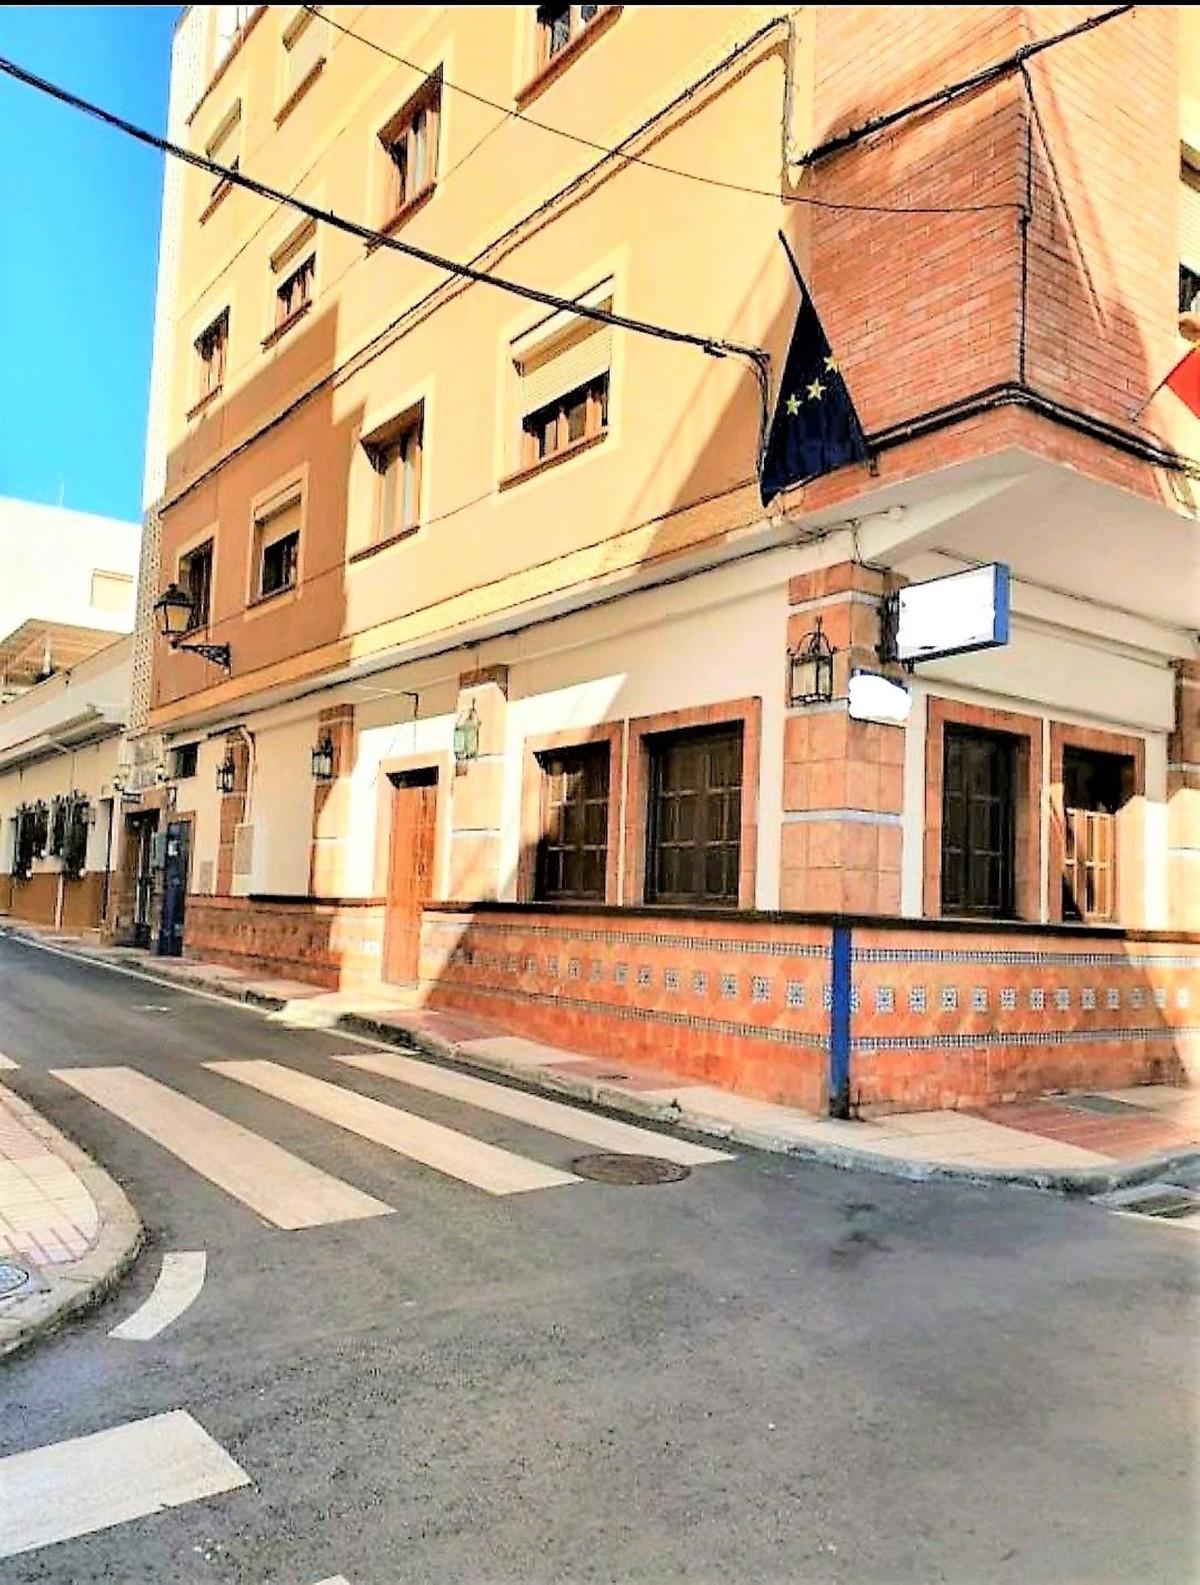 FANTASTIC HOSTAL IN THE HEART OF SAN PEDRO DE ALCANTARA, Great Investment Opportunity! Return assure,Spain